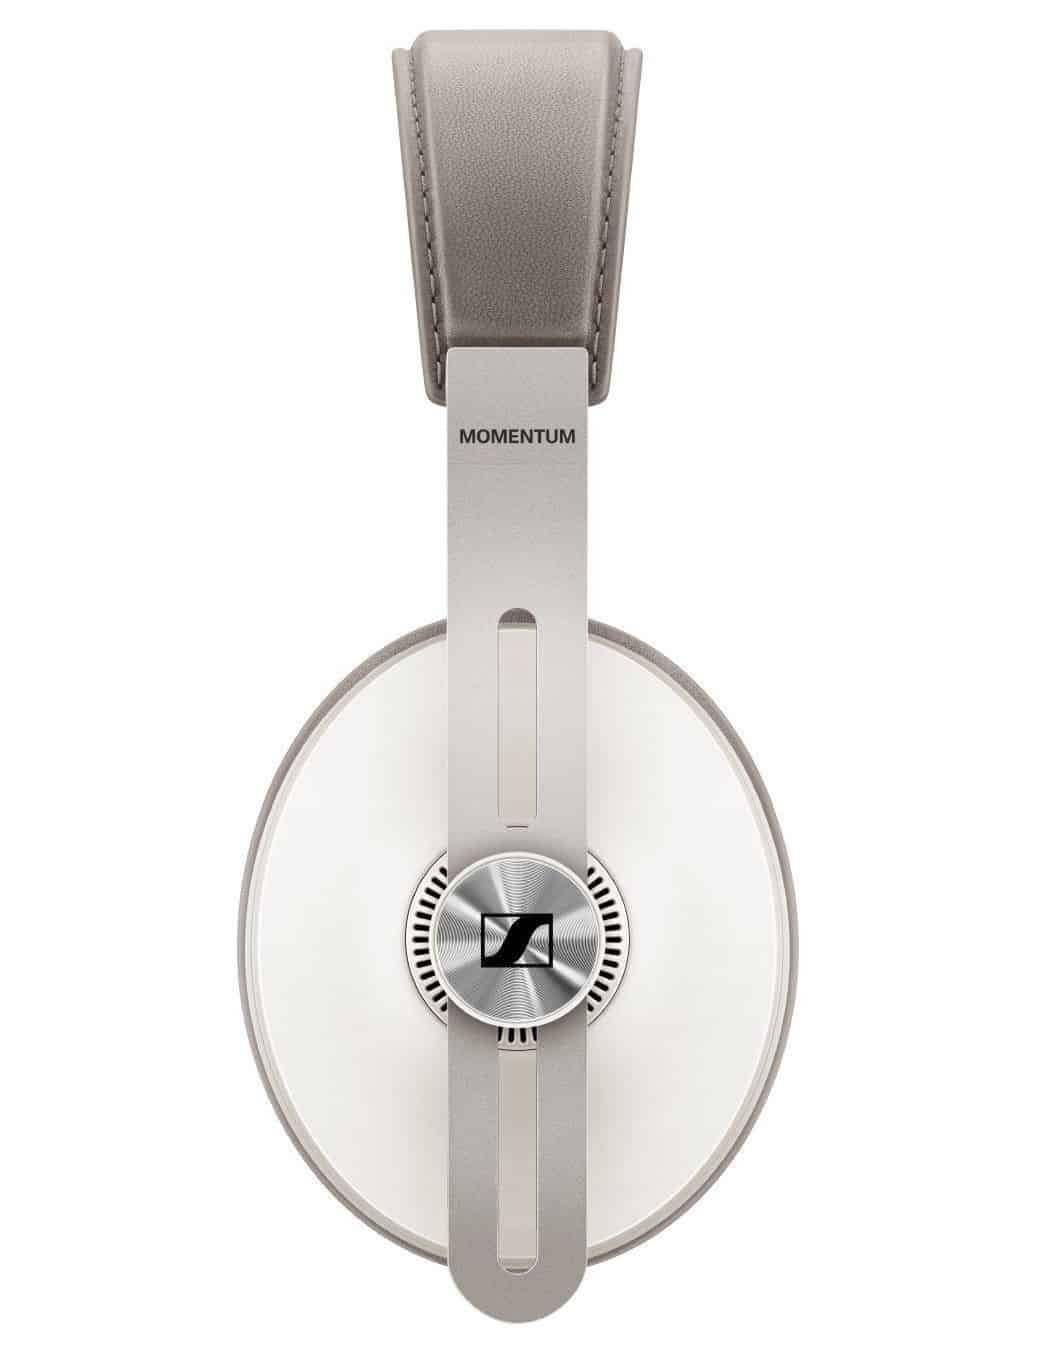 Sennheiser Momentum Wireless Headphones 7